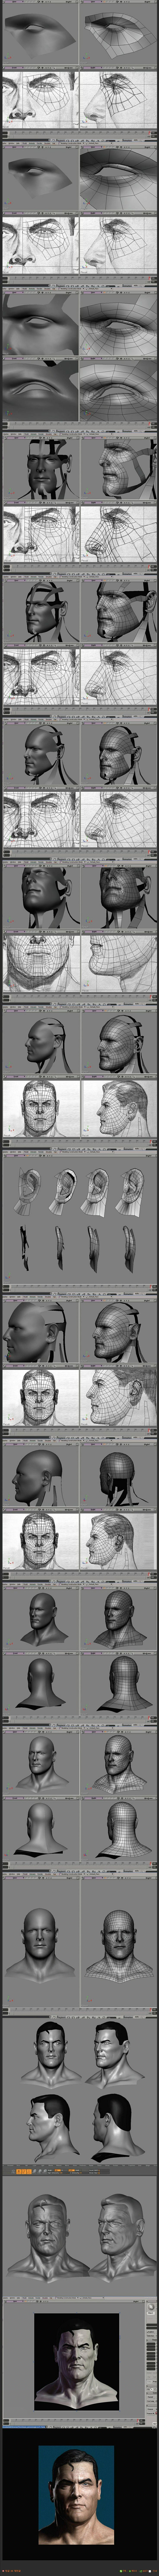 face_modeling